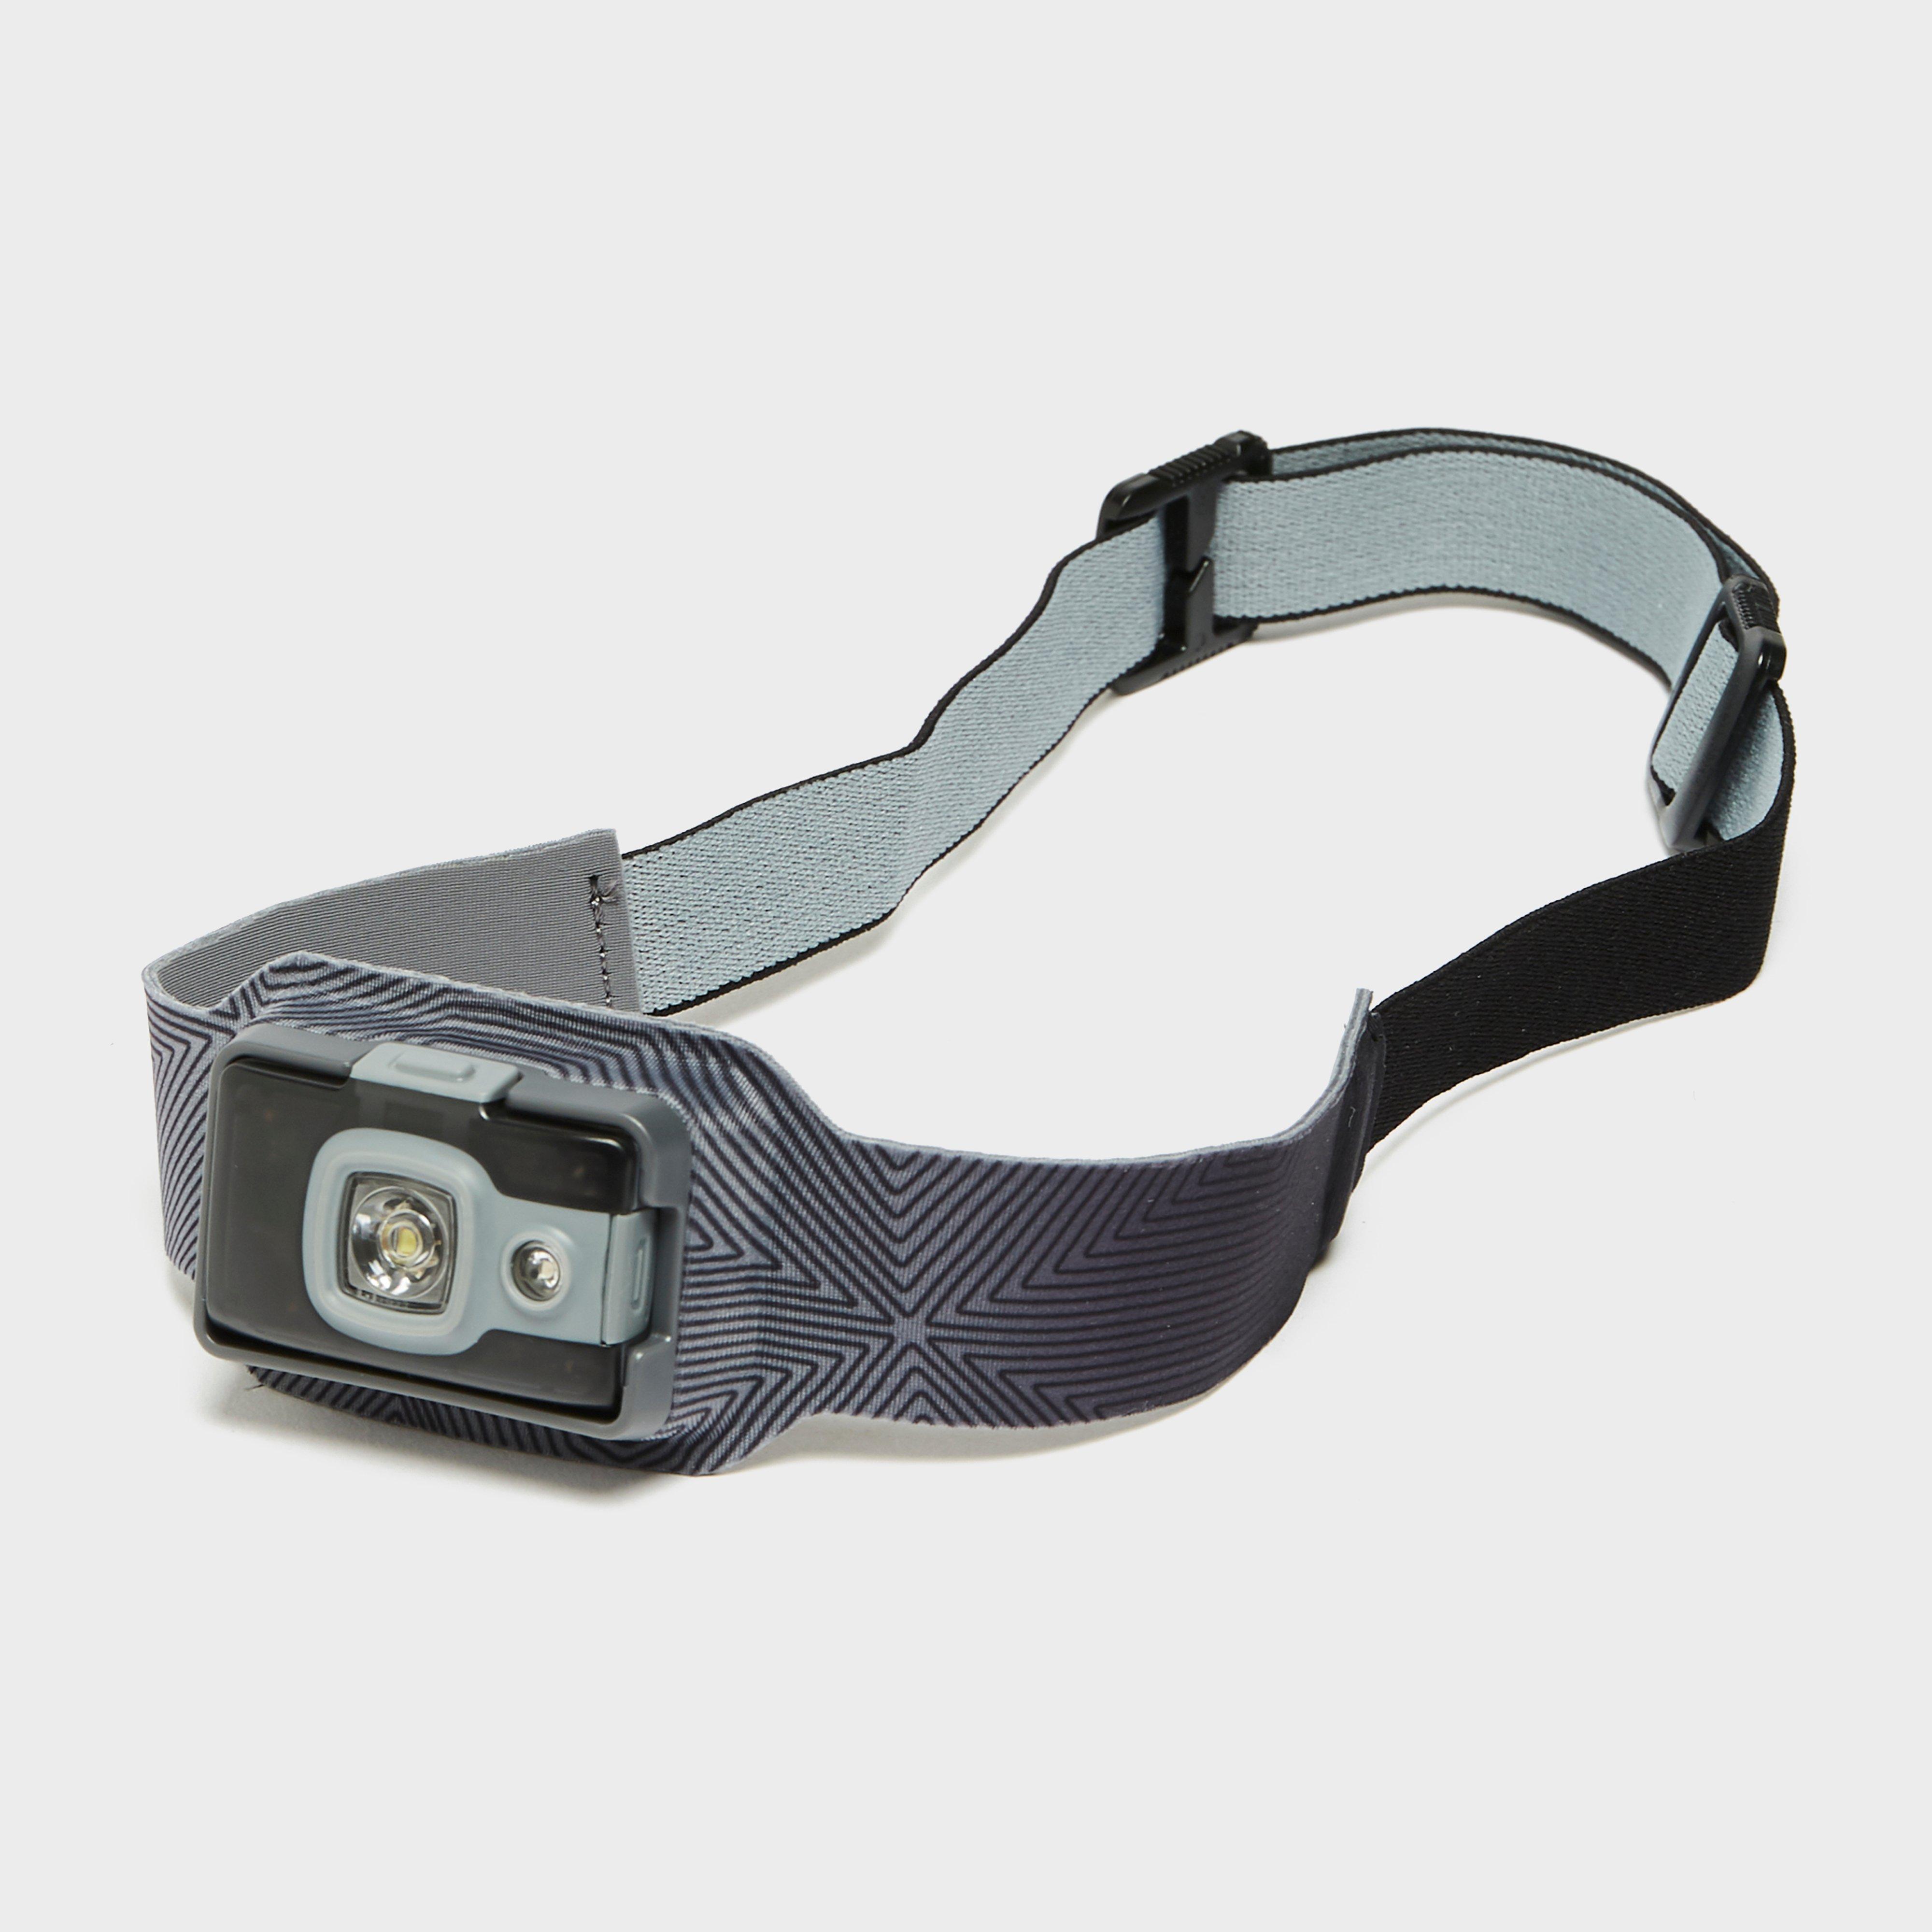 Biolite Headlamp 200 - Black/200  Black/200